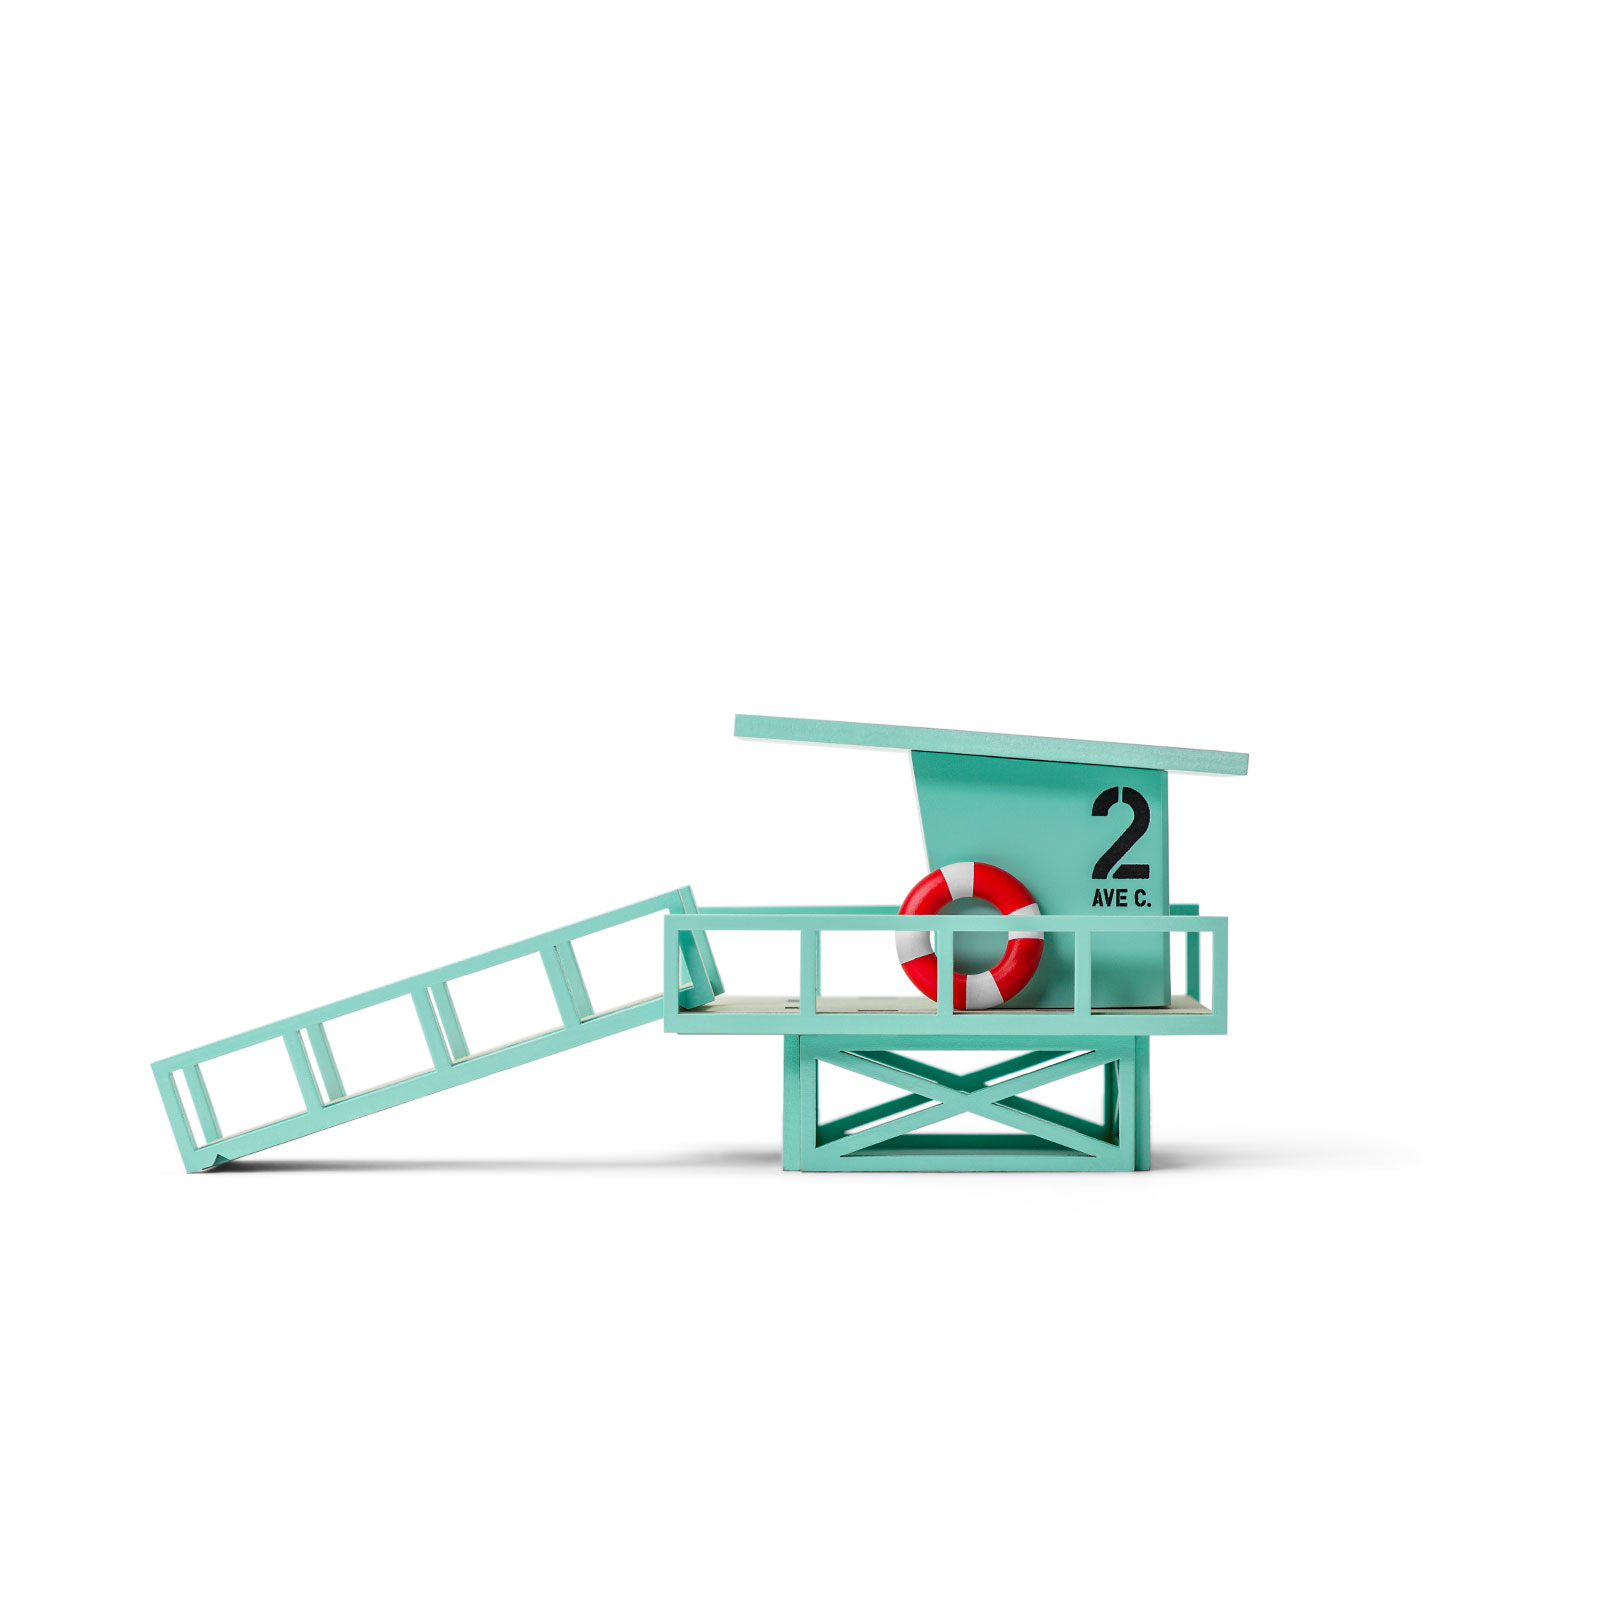 Candylab - STAC Malibu Lifeguard Tower